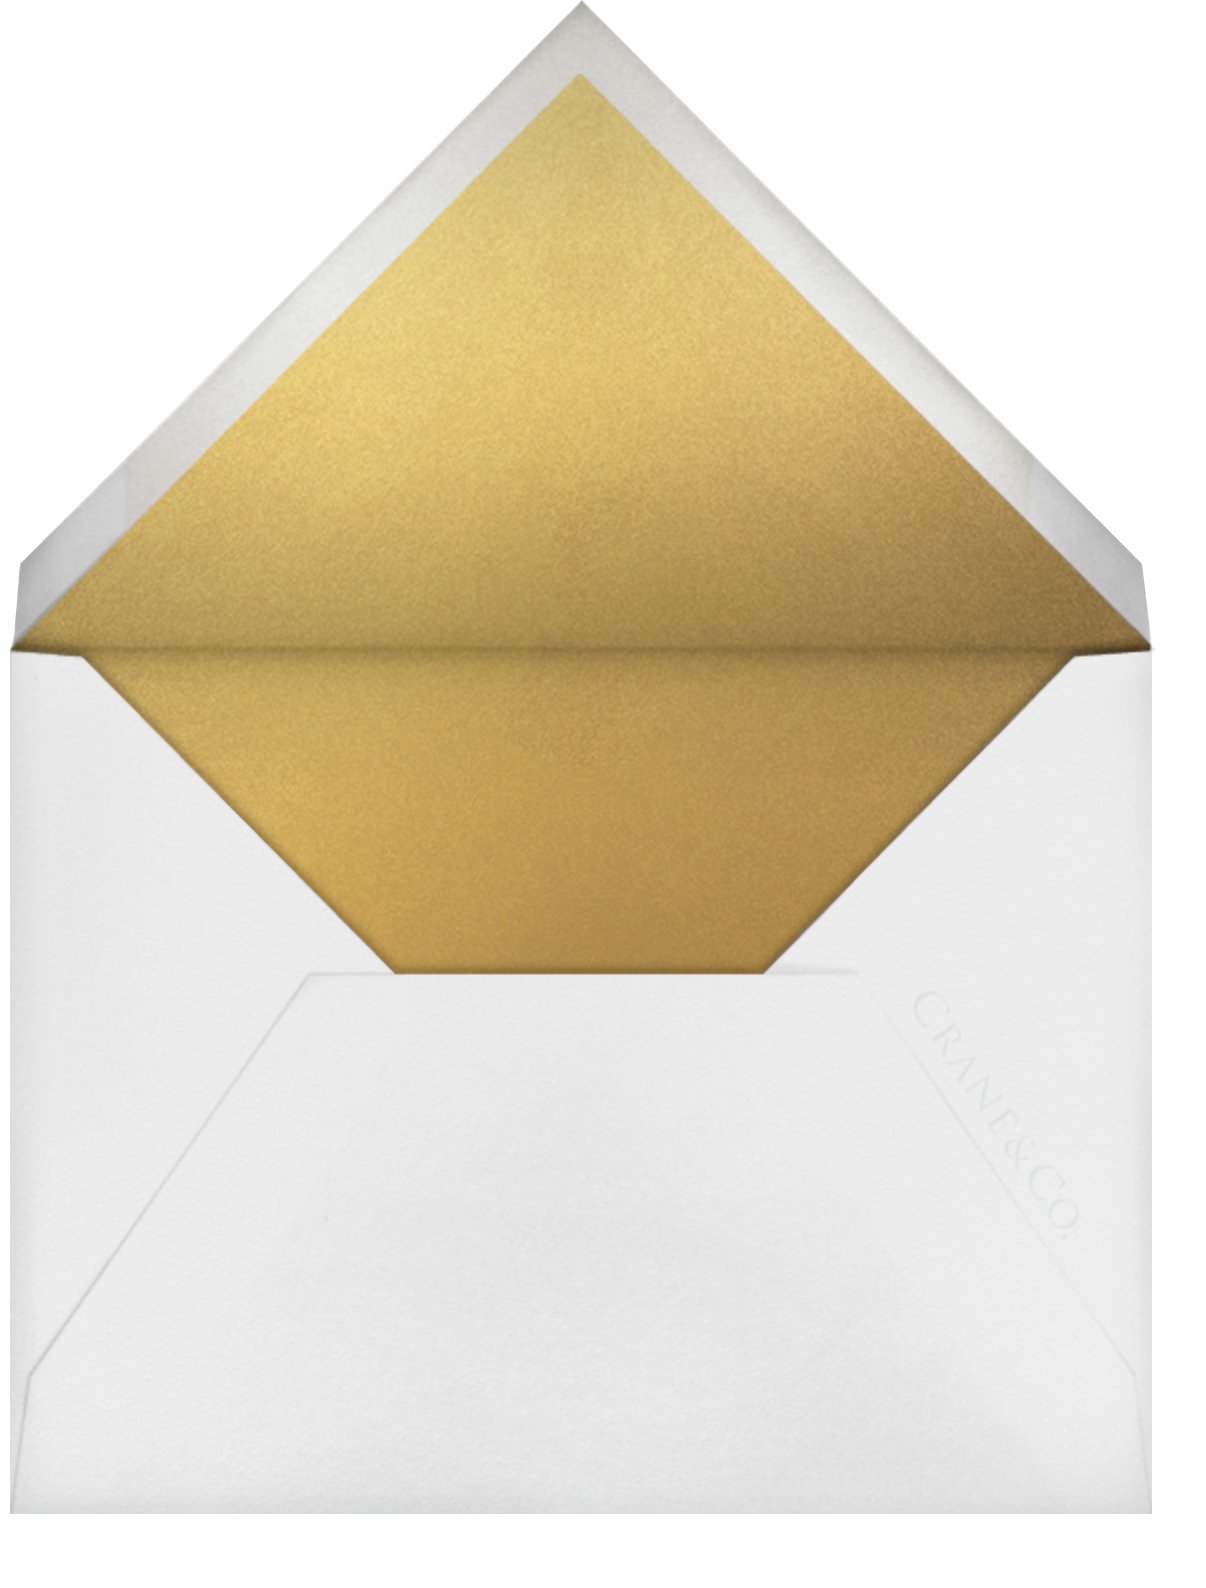 Miller (Save The Date) - Medium Gold - Crane & Co. - Save the date - envelope back